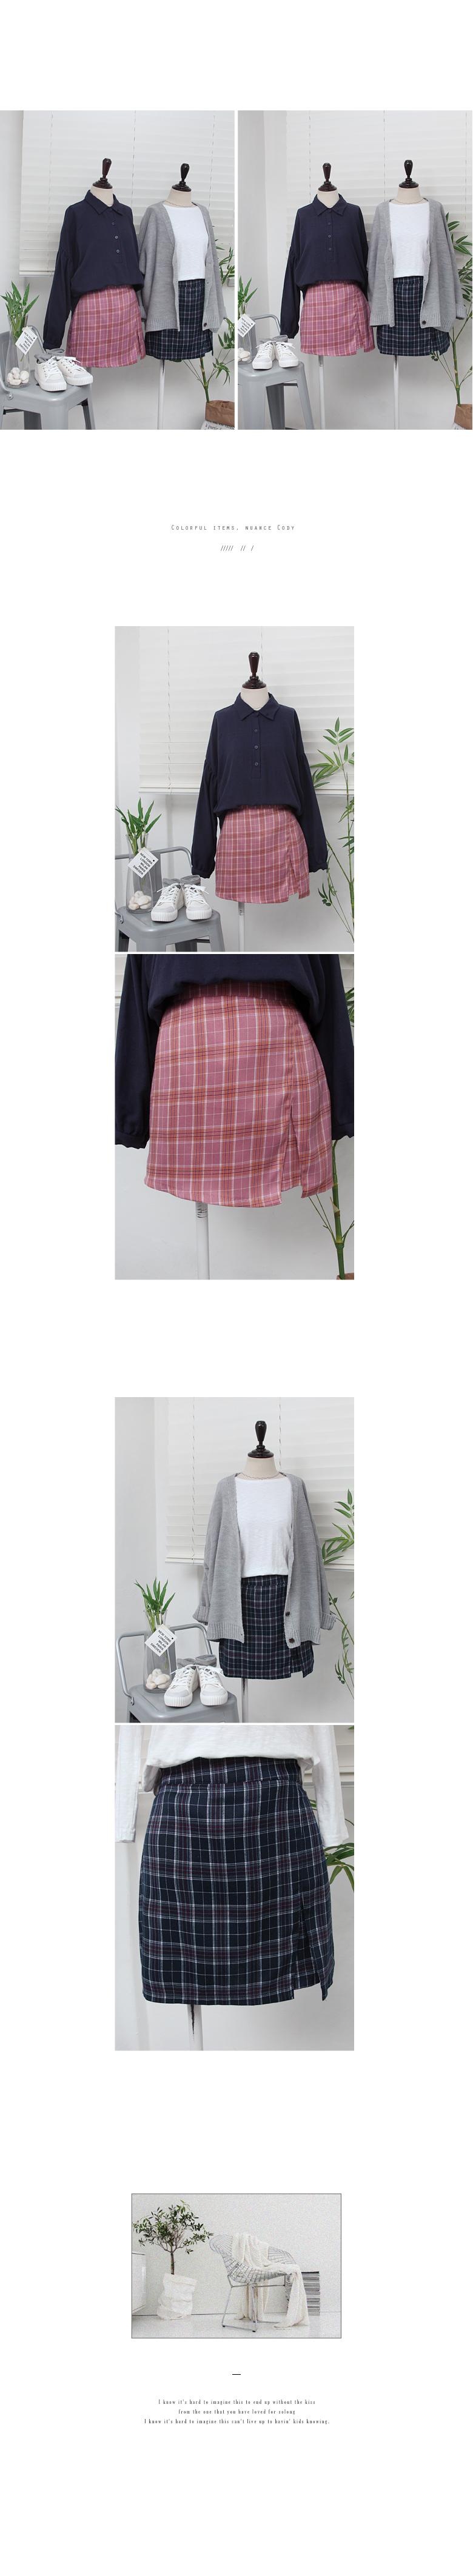 Rimming skirt pants